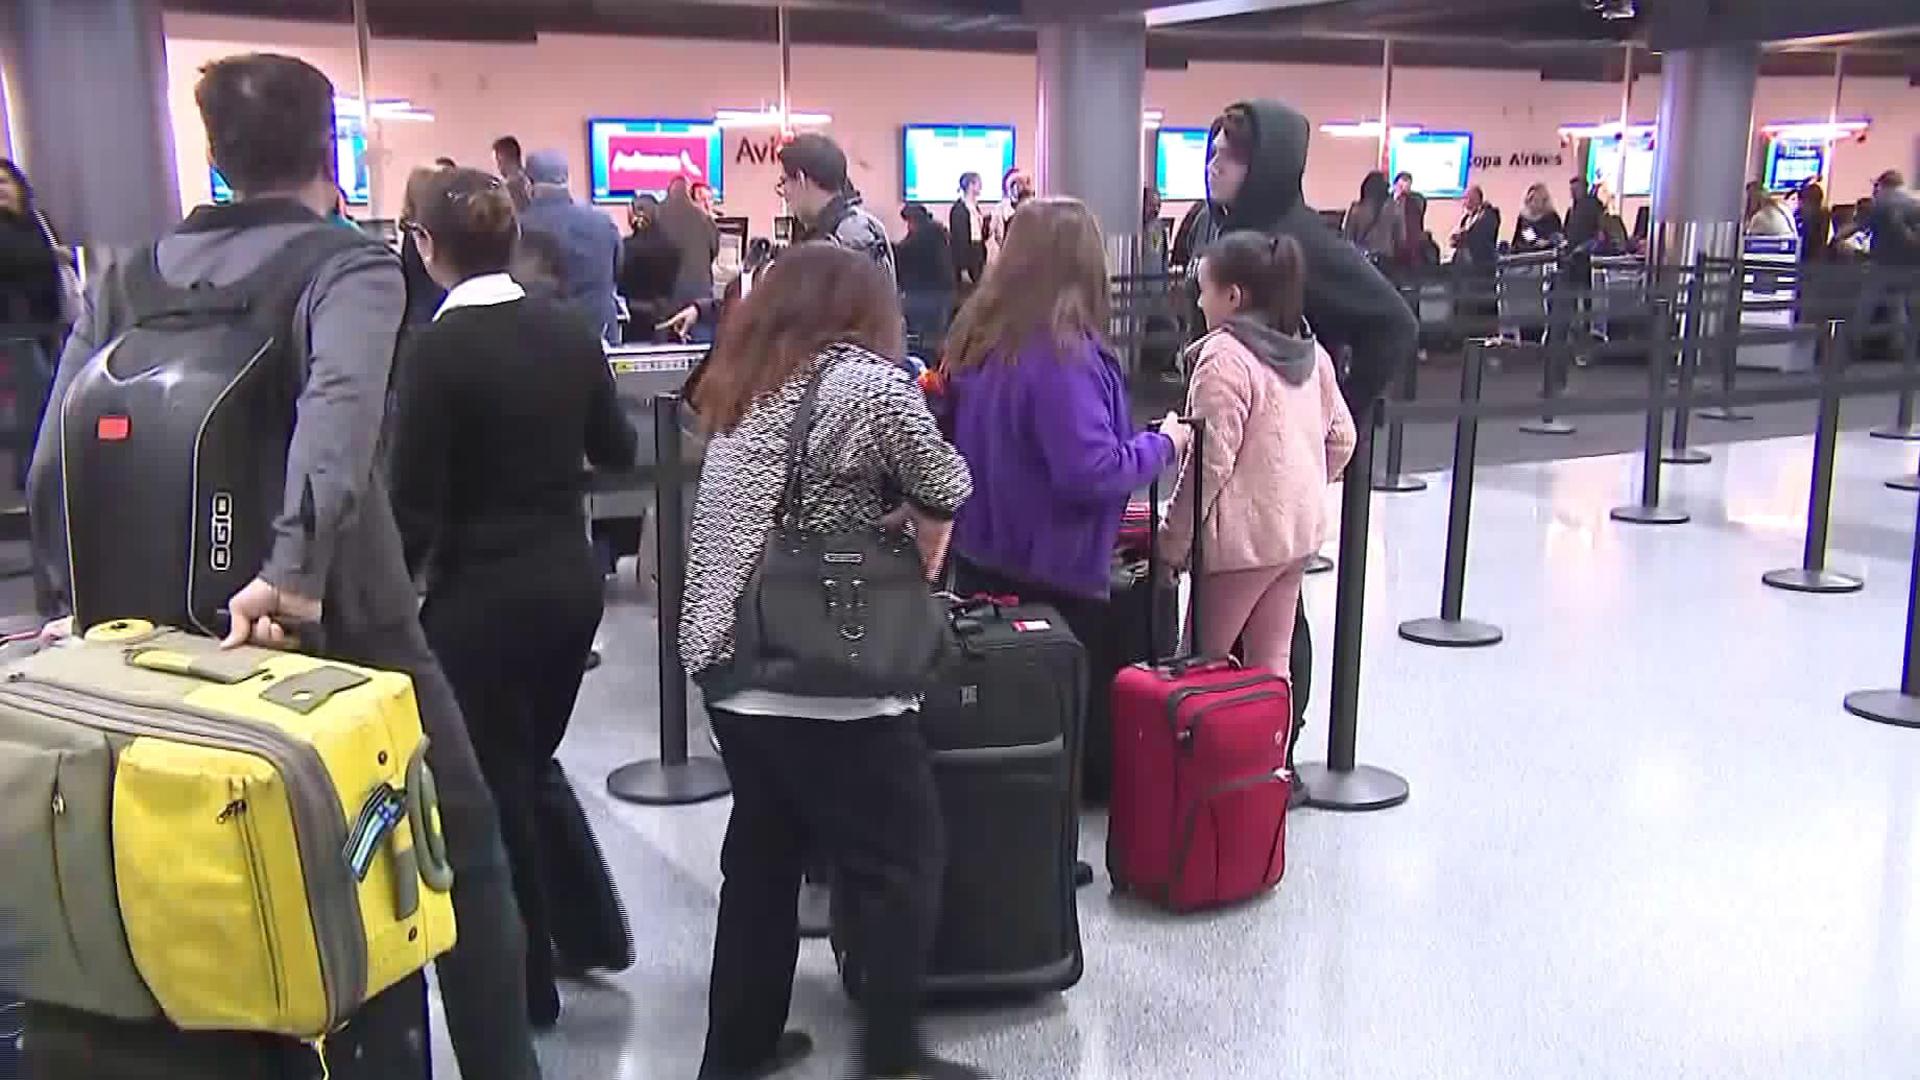 Travelers pass through LAX on Dec. 20, 2017. (Credit: KTLA)